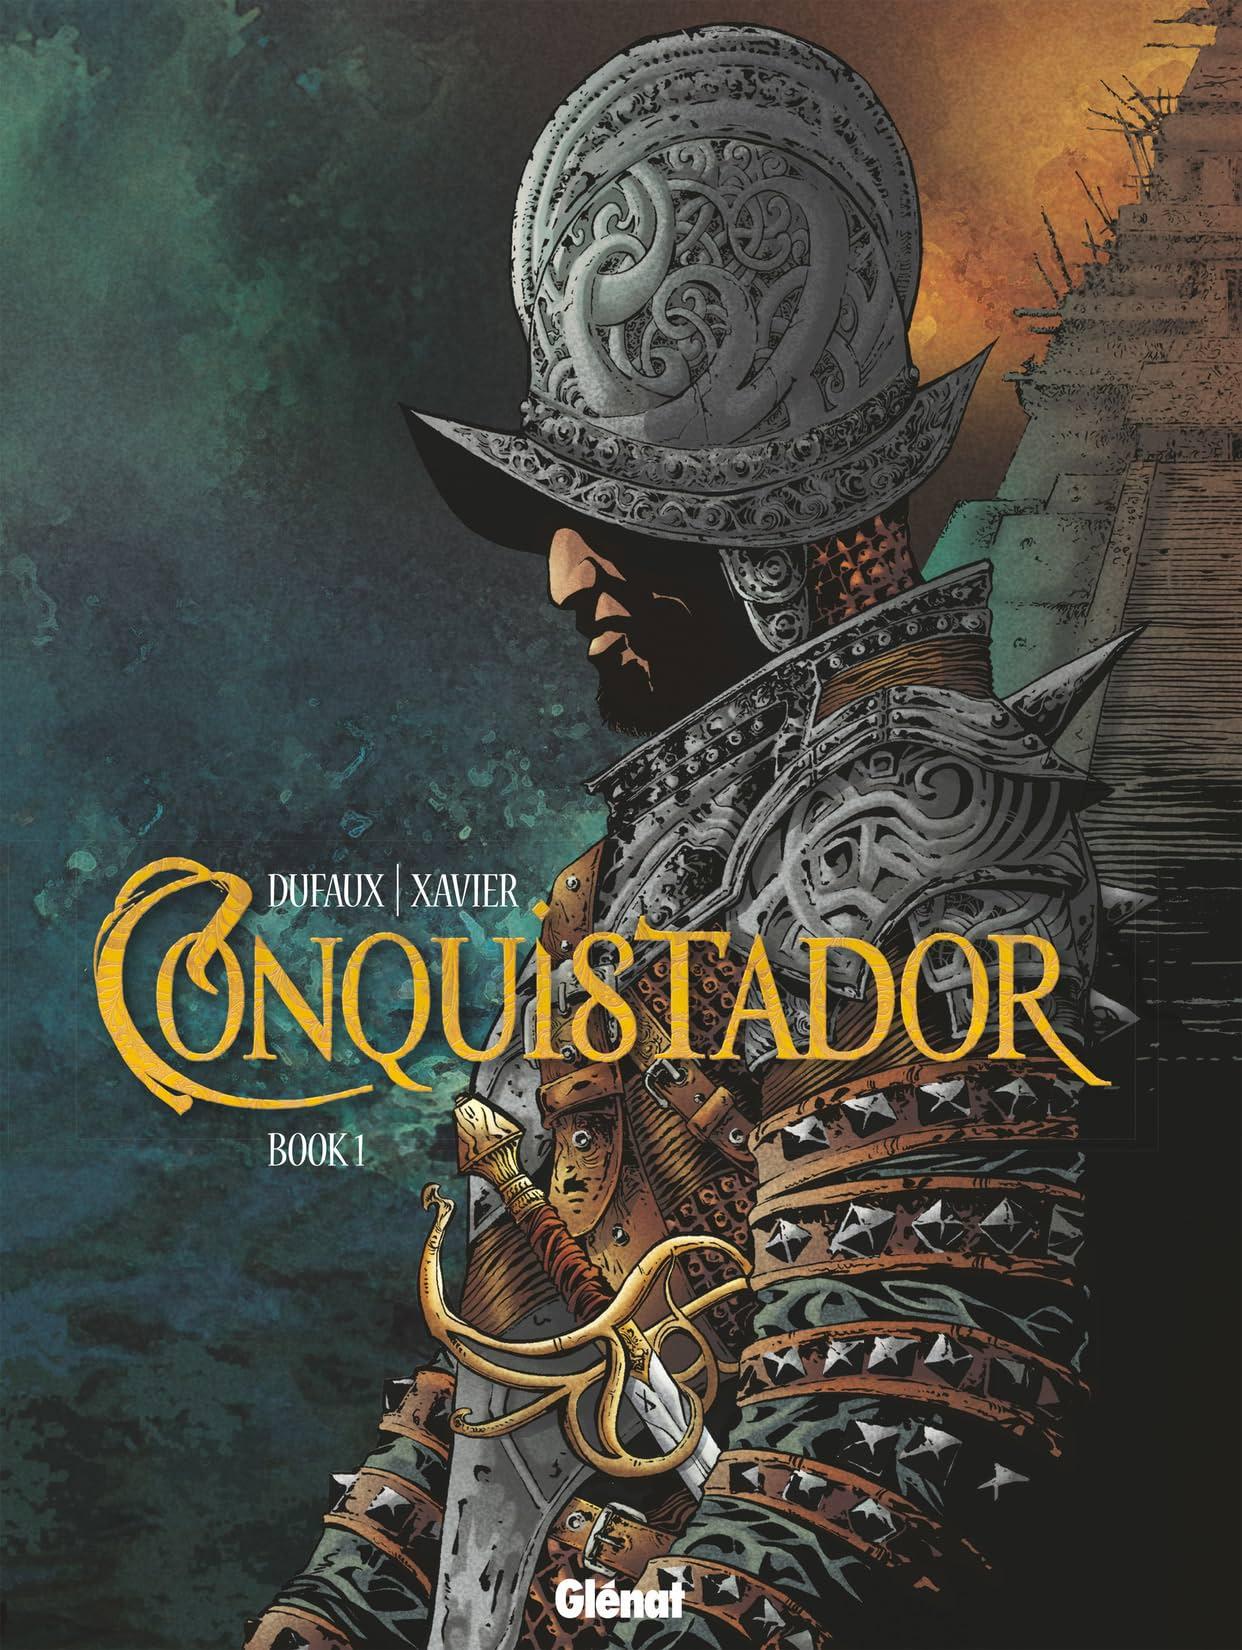 Conquistador Vol. 1